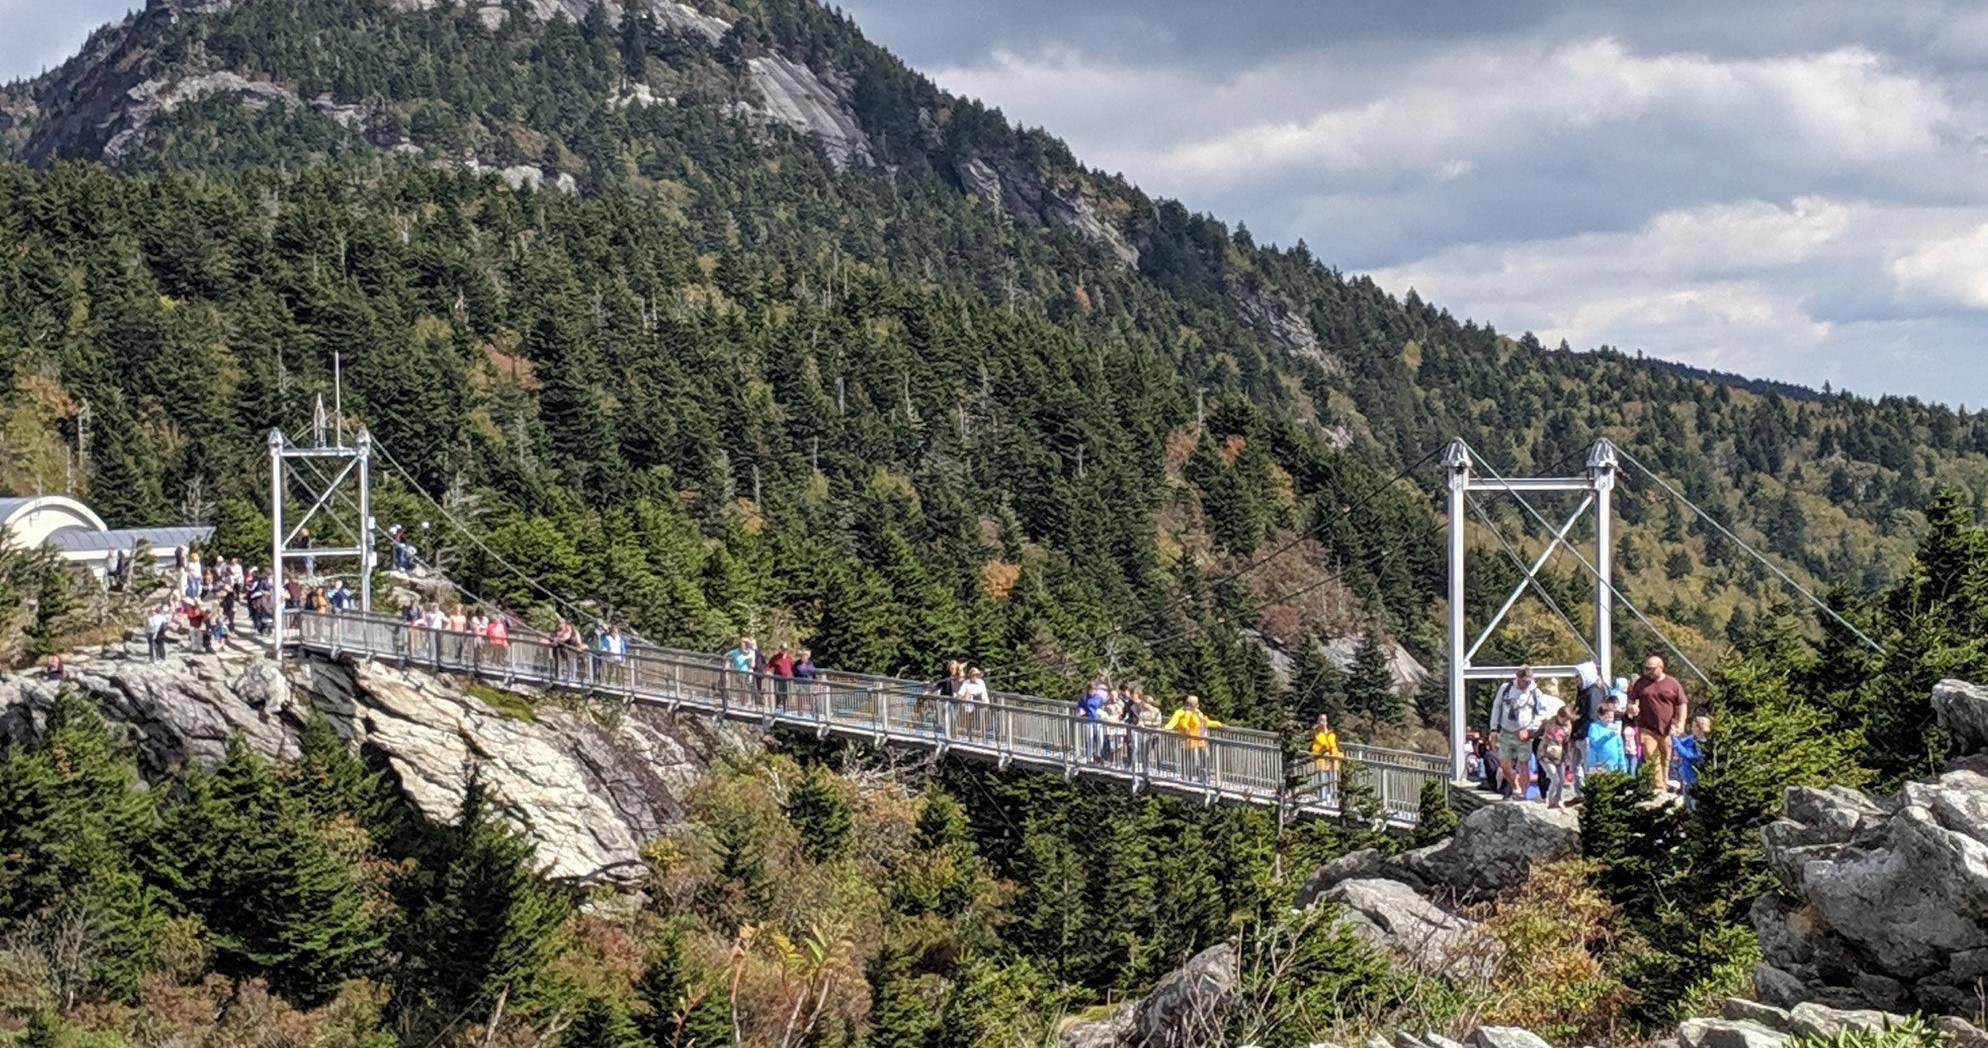 Swinging bridge on Grandfather Mtn